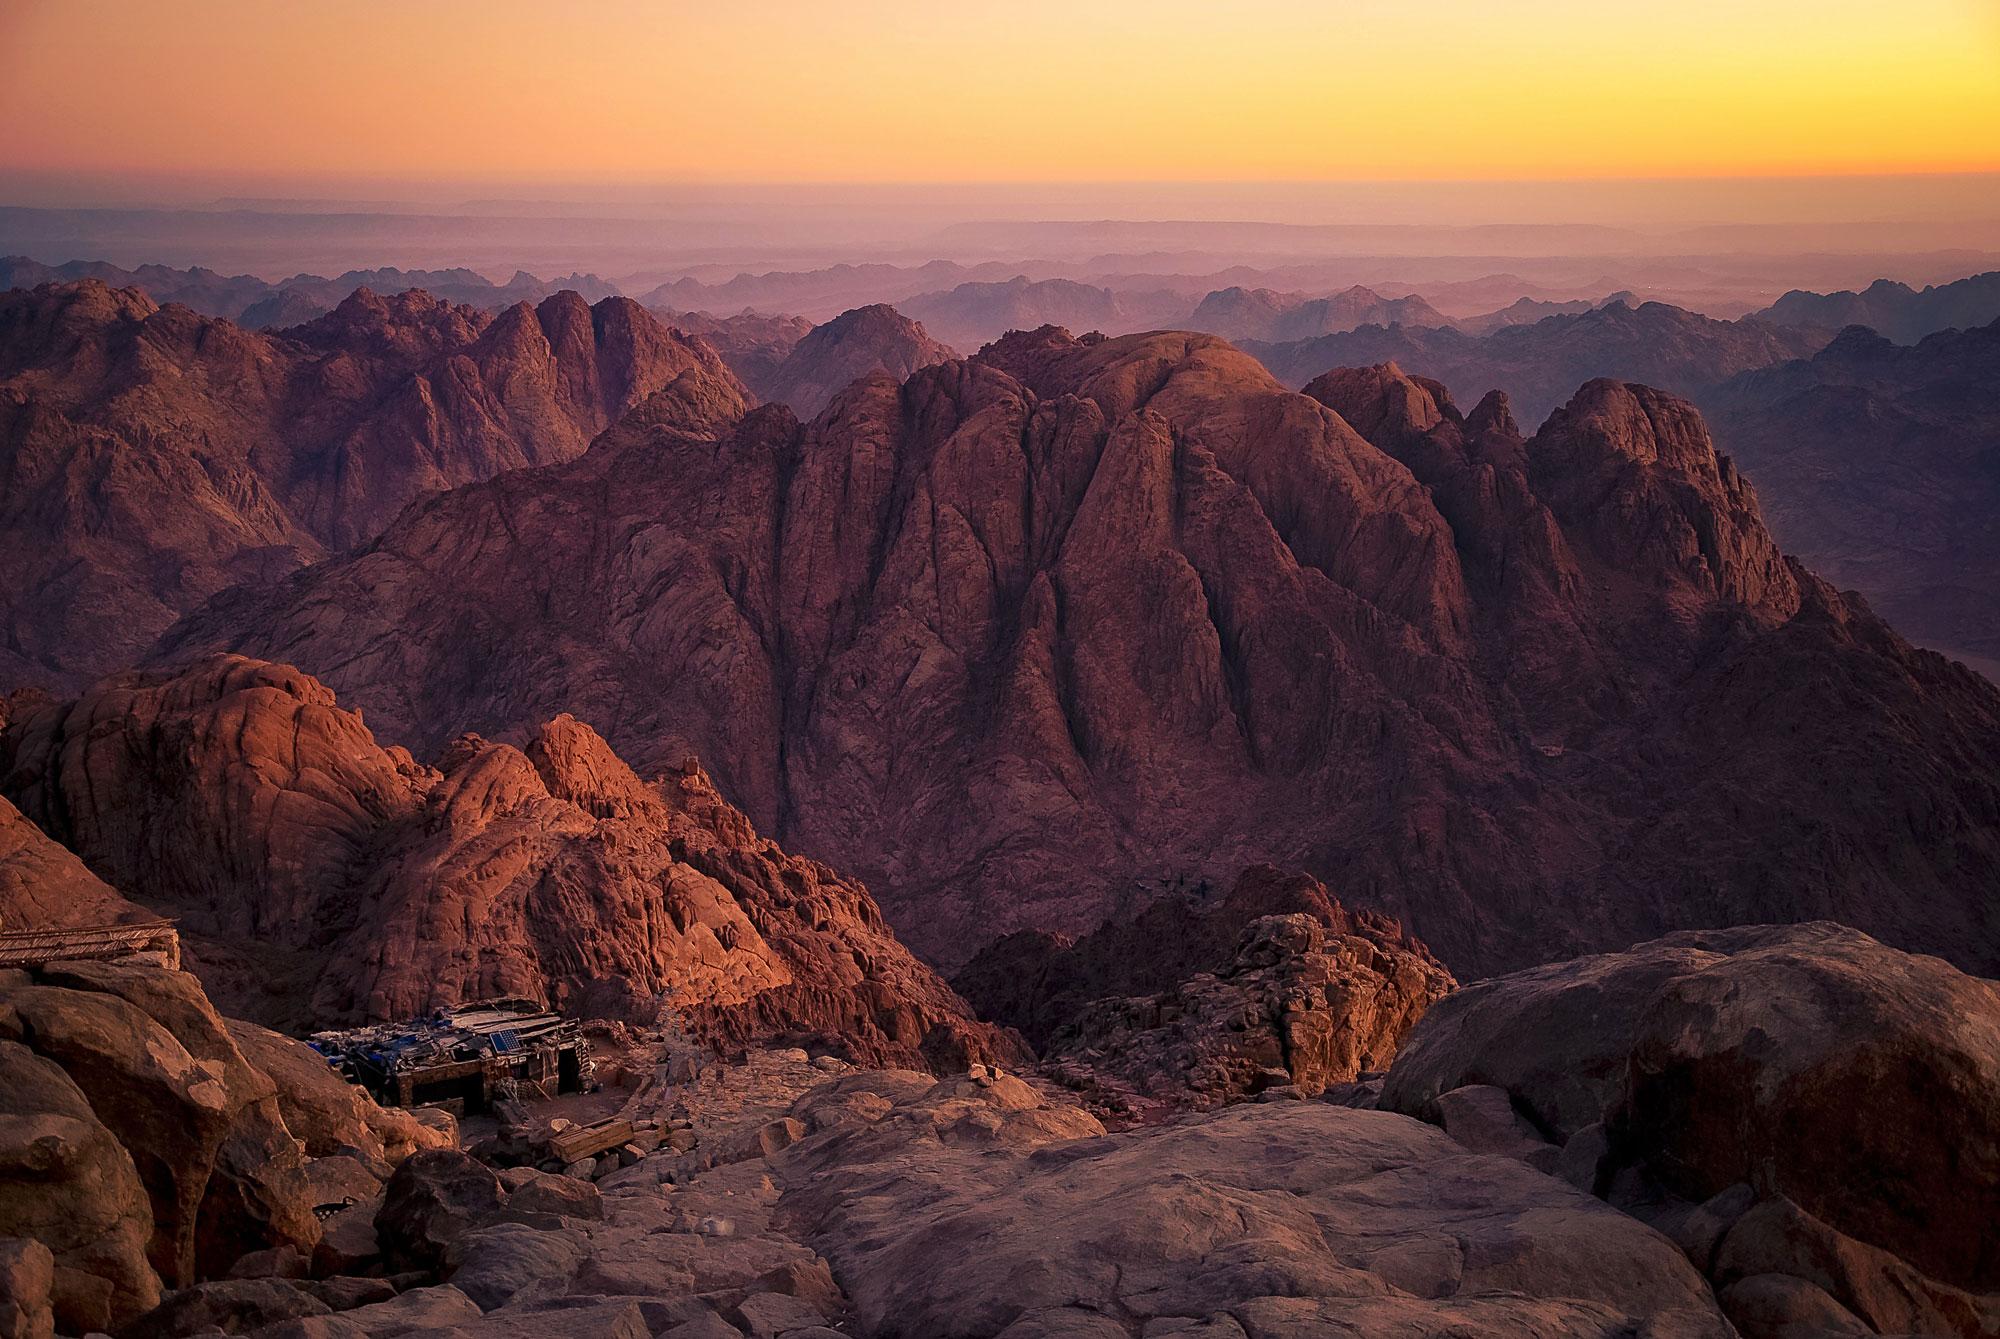 Jebel Musa (2285m) in the Sinai Peninsula of Egypt, often thought to be Mt. Sinai. [Photo] Mohammed Moussa, Wikimedia